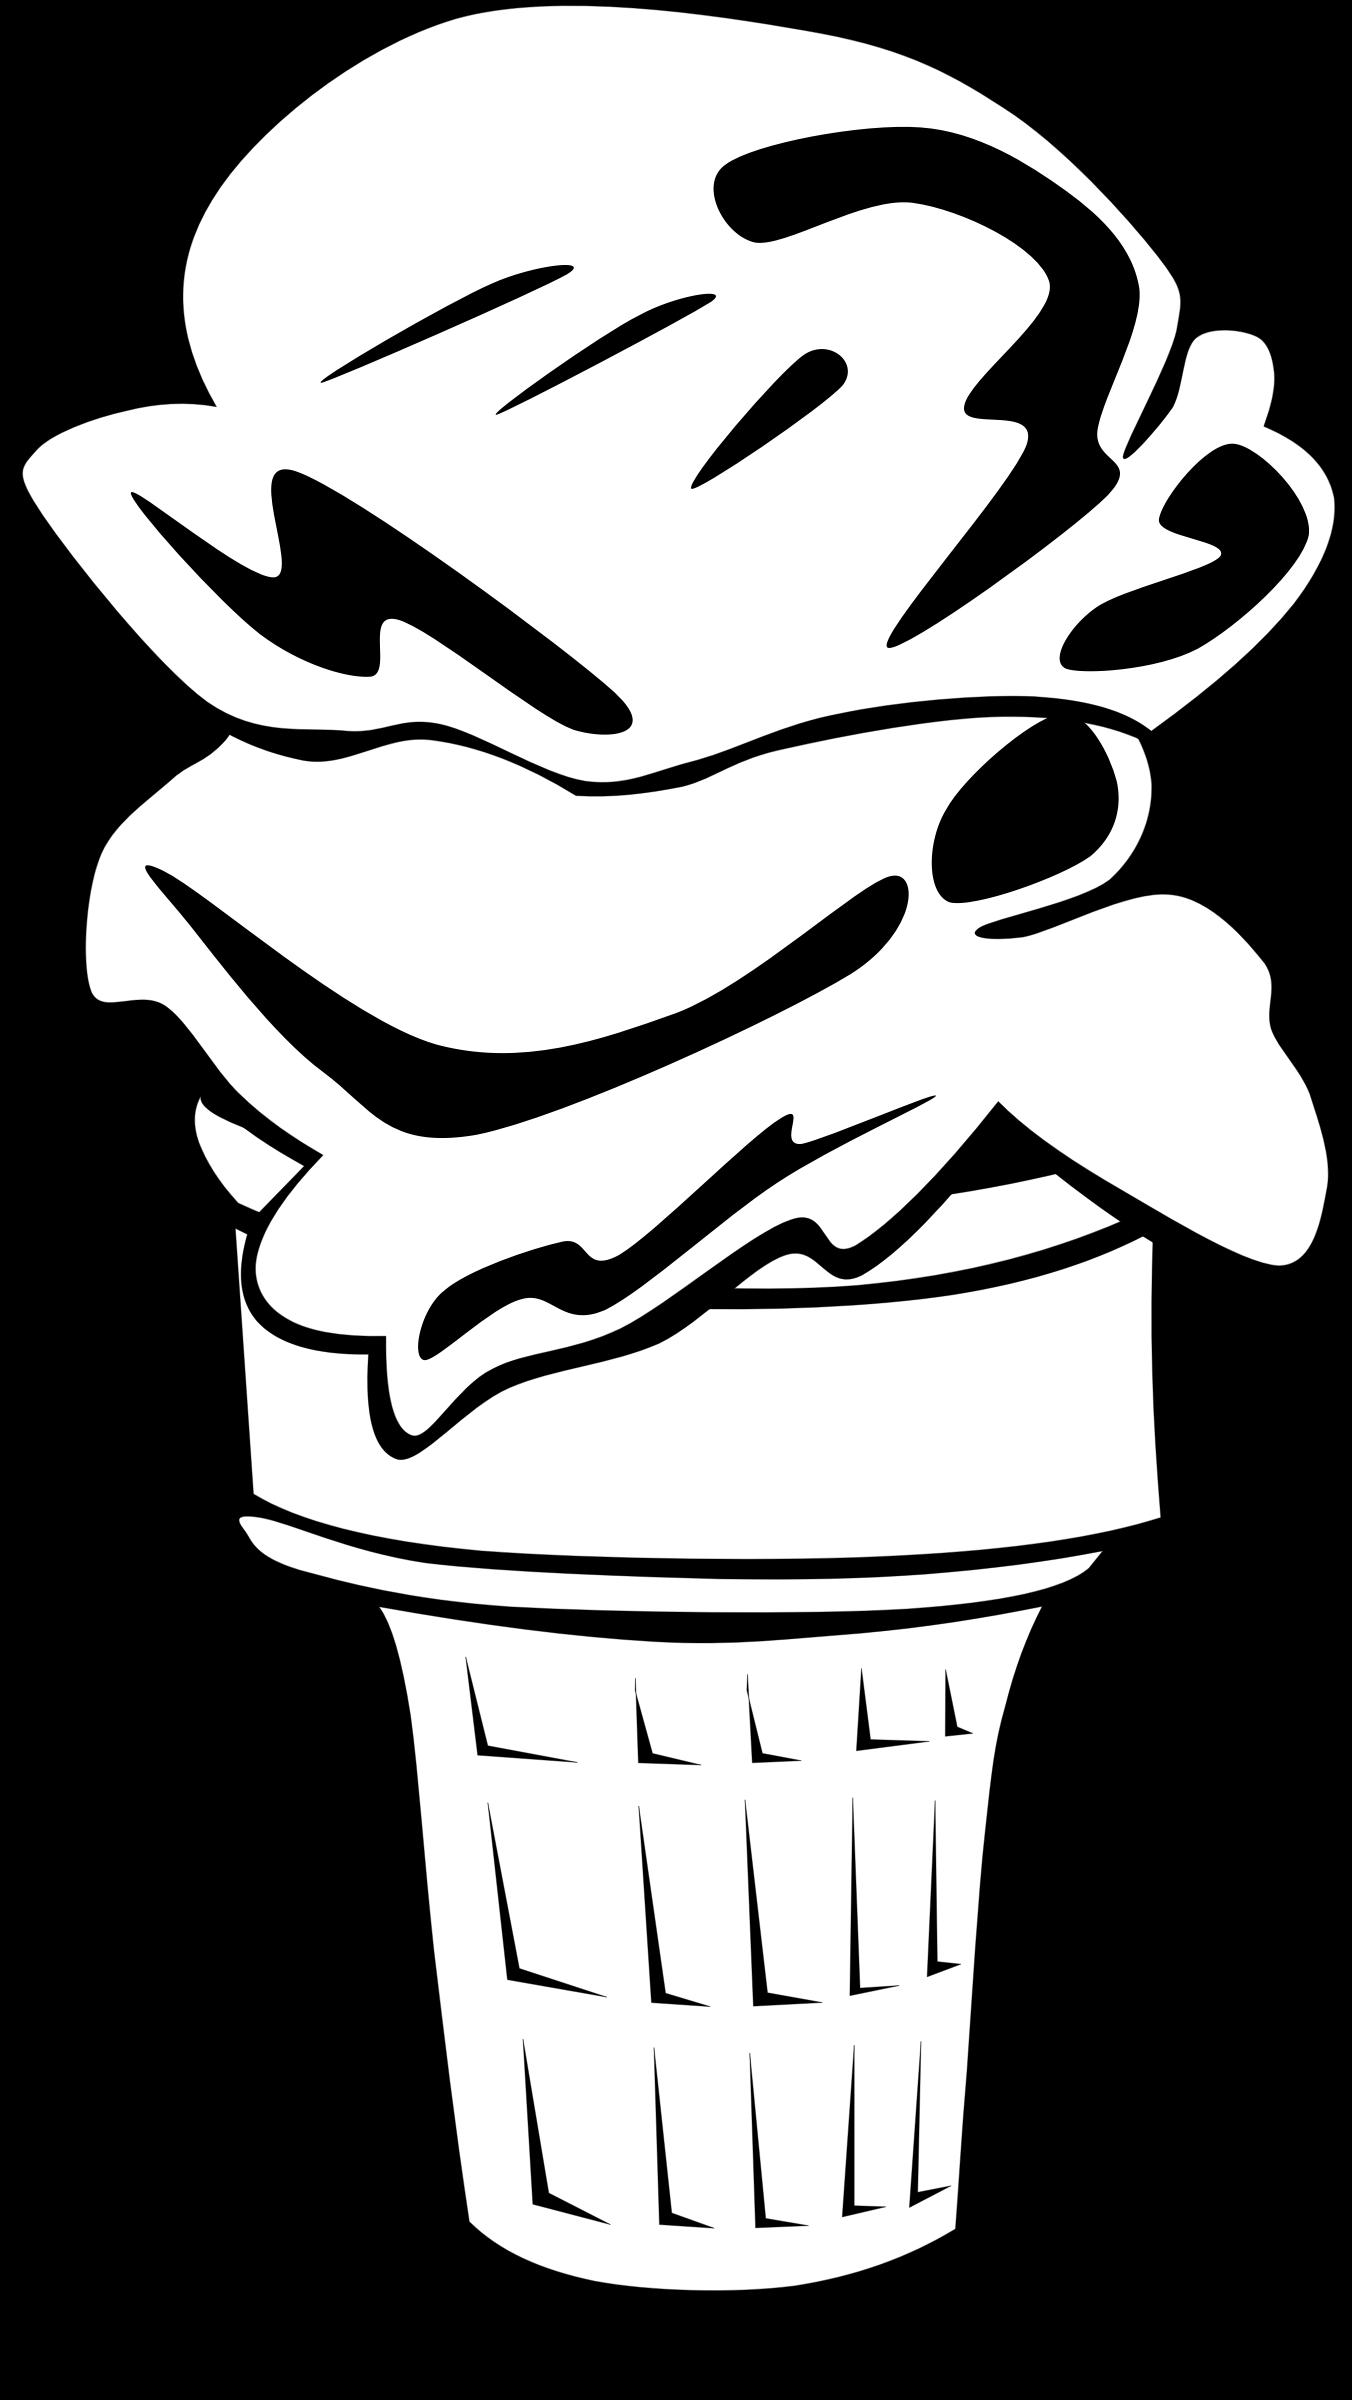 graphic stock Fast food desserts cone. Ice cream scoop clipart black and white